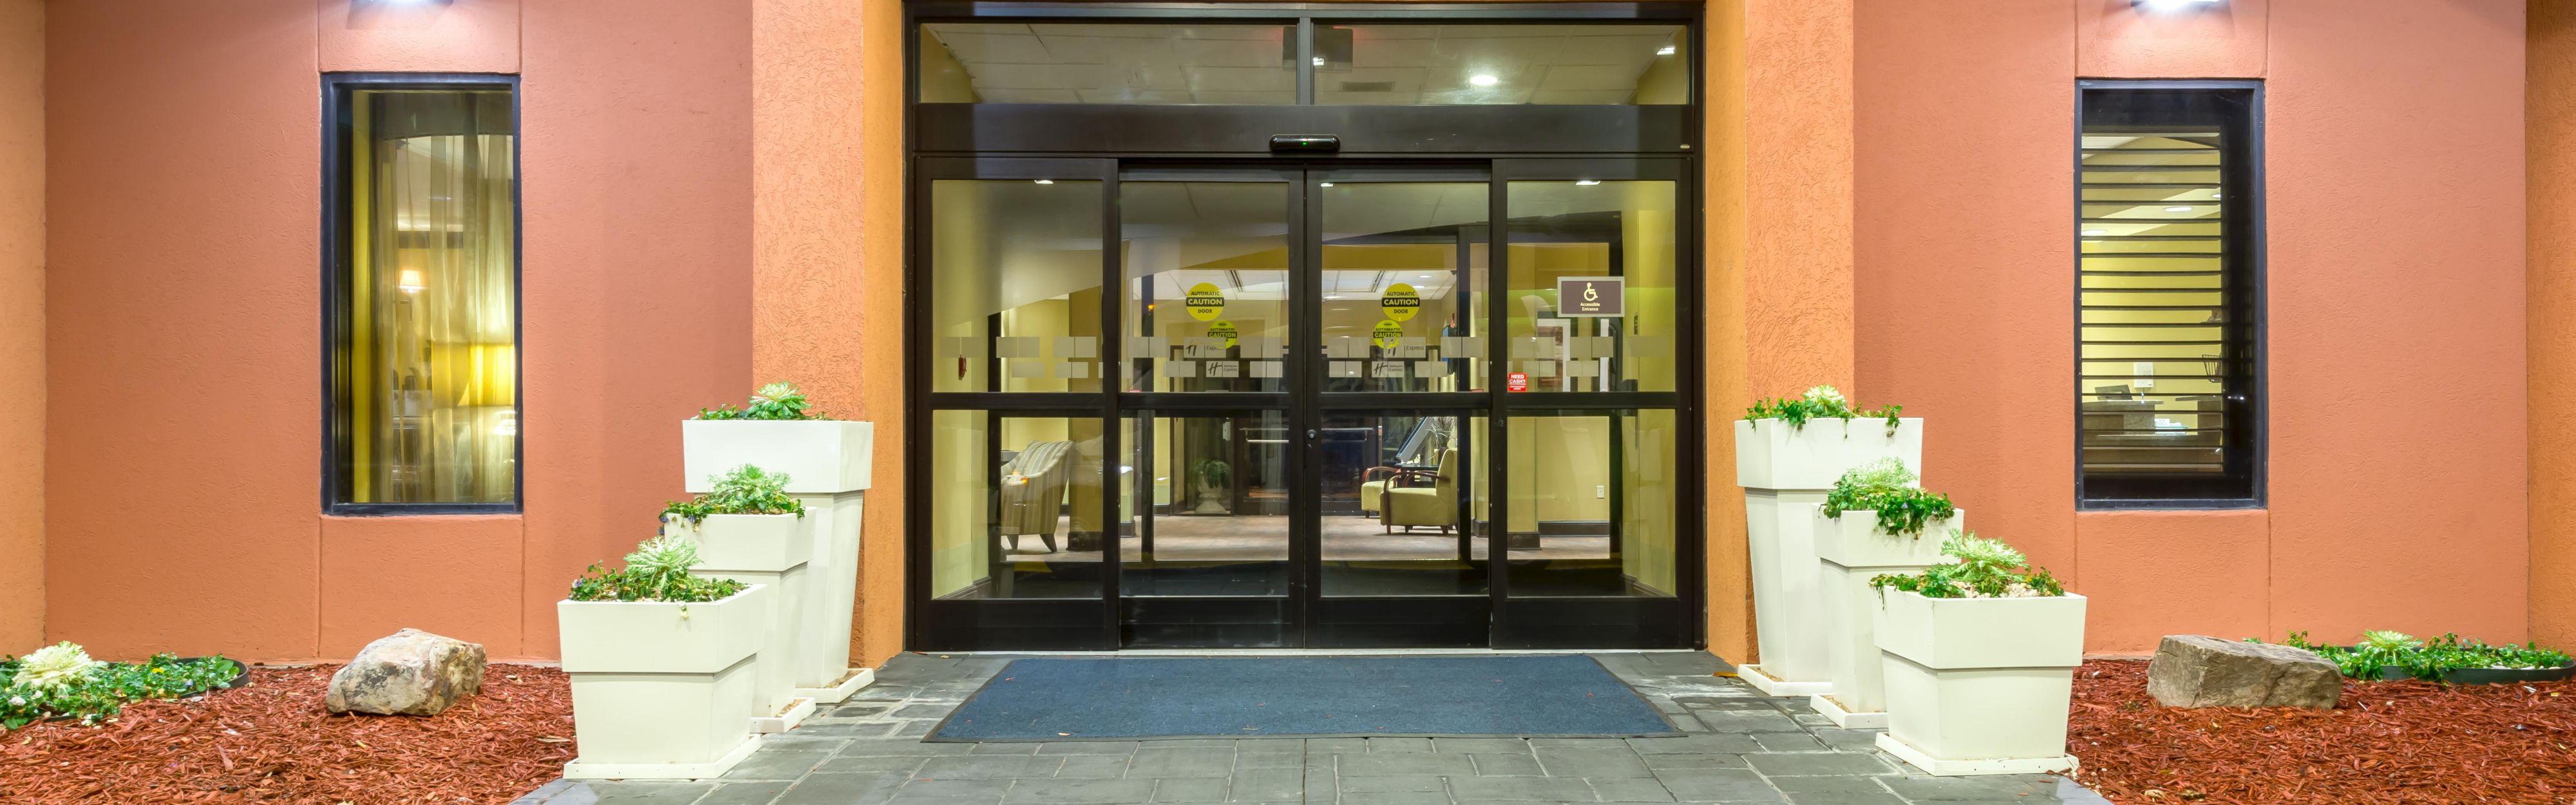 Hotels Near College Park Ga Affordable Doubletree Hotel Atlanta